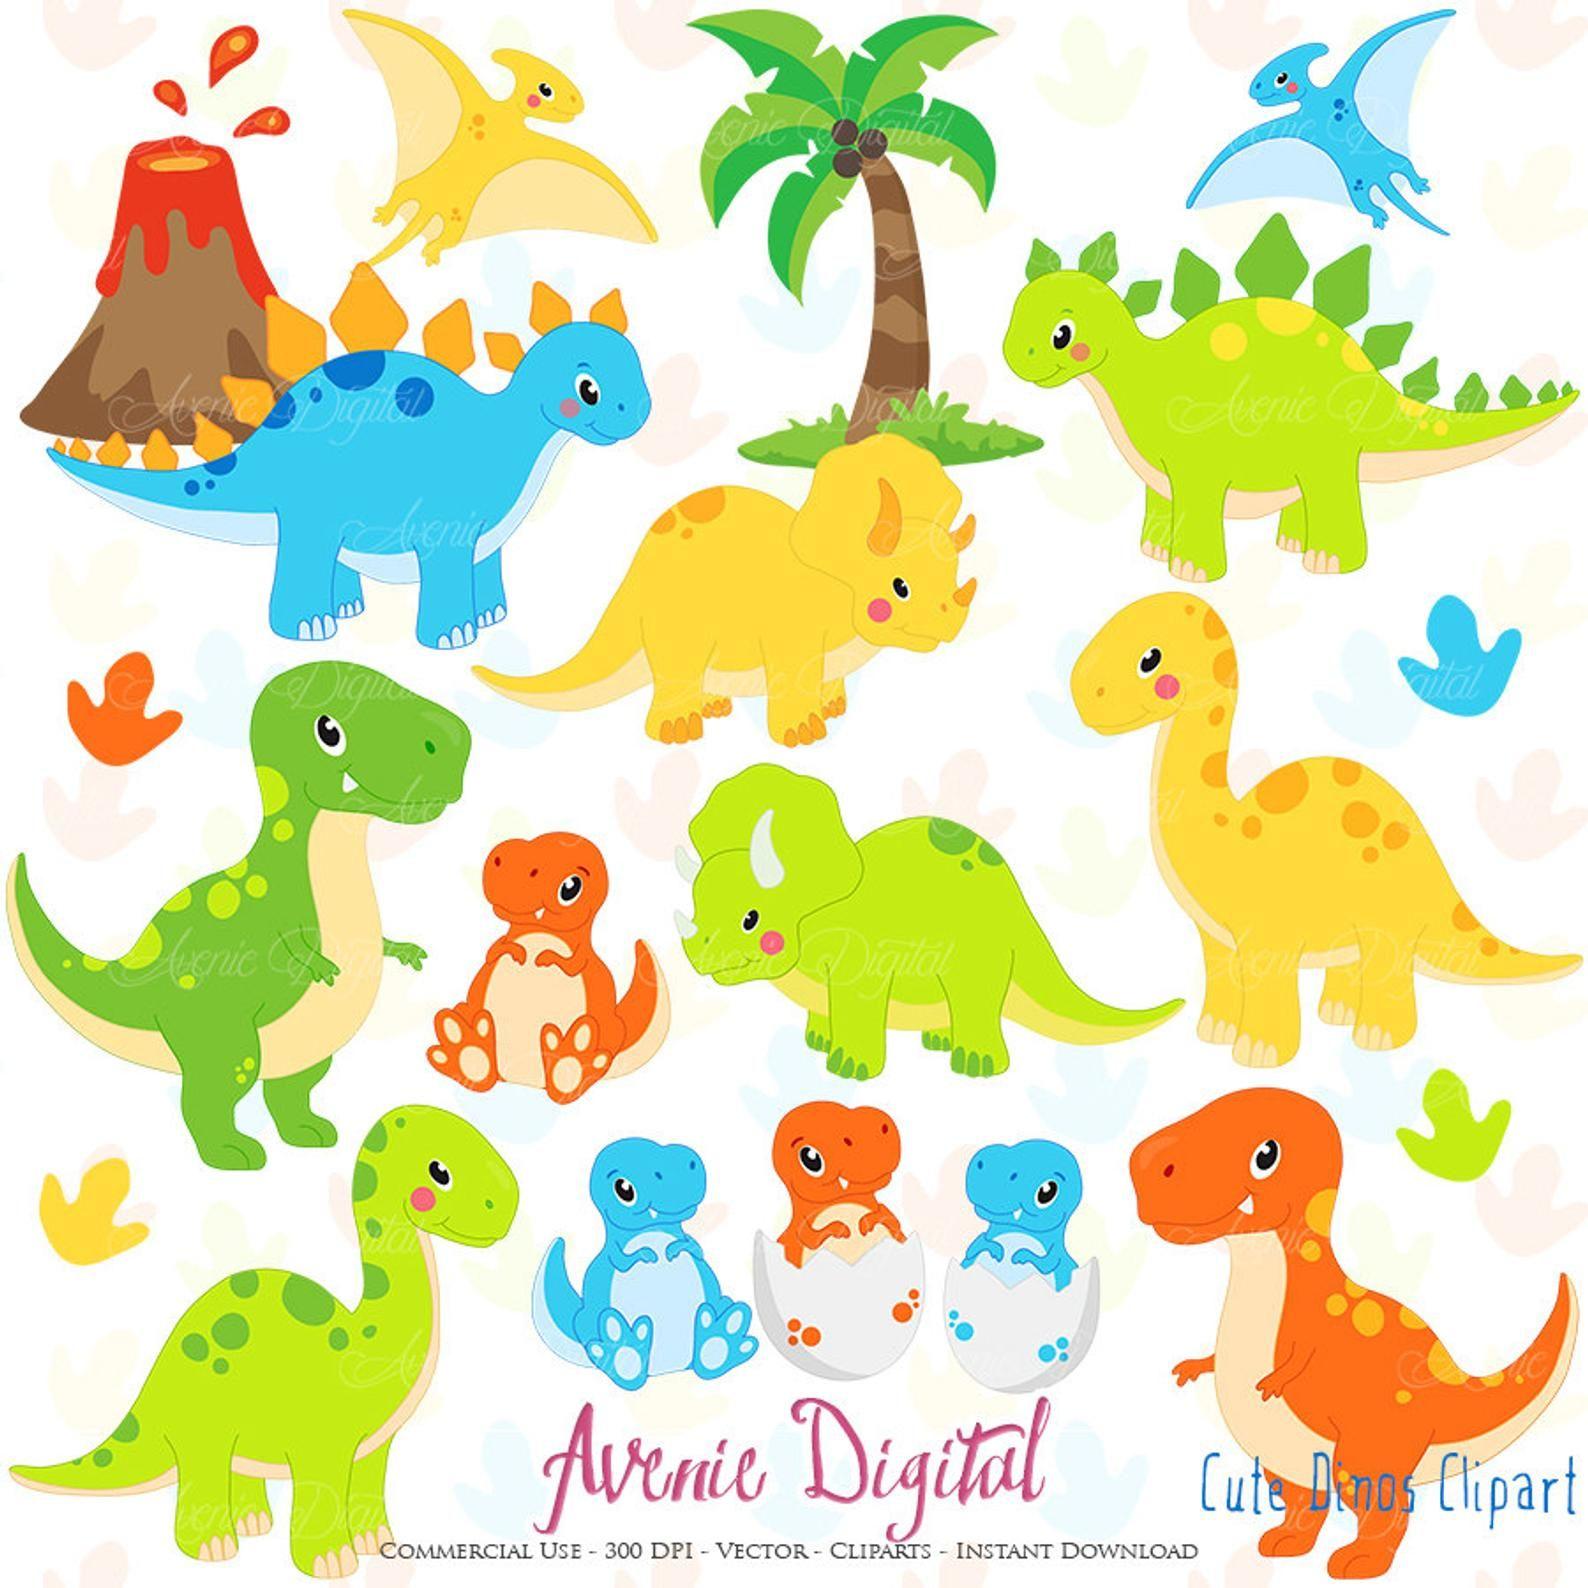 Cute Dinos Clipart Scrapbook Printable Dinosaur Clip Art Etsy Dinosaur Clip Art Dinosaur Pictures Dinosaur Images